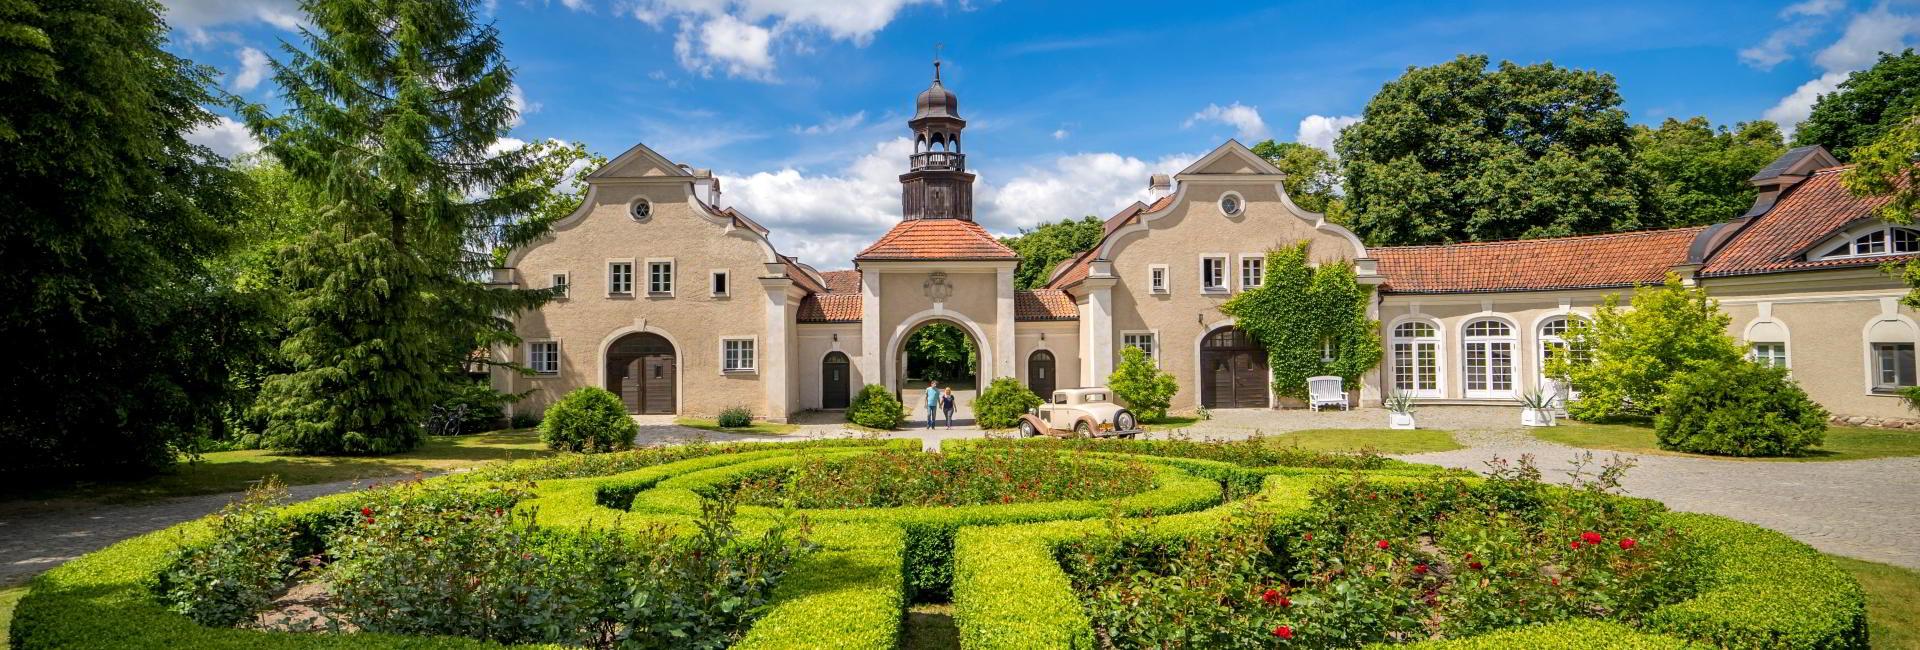 Palac i Folwark Galiny in Bartoszyce, Poland